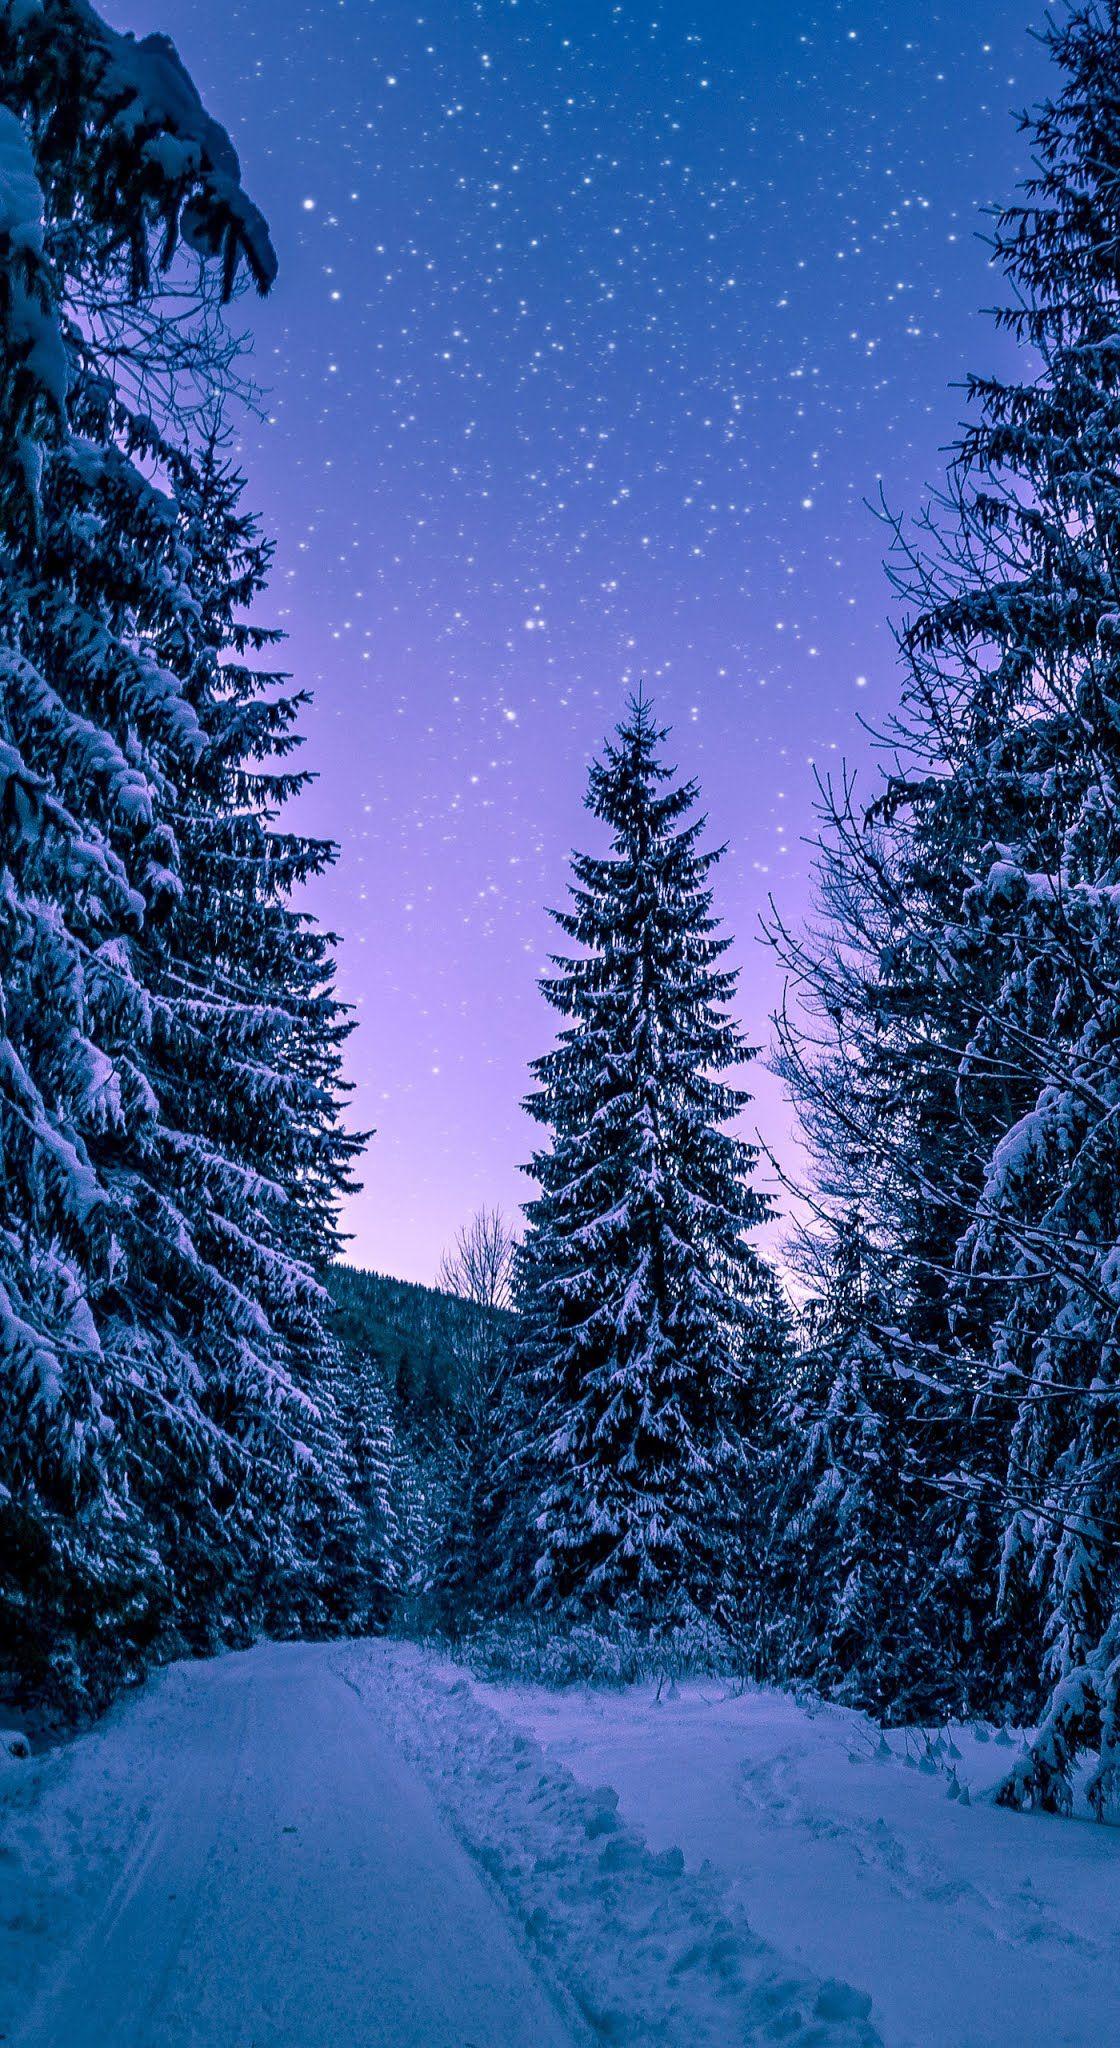 Branches Cold Conifers Mobile Wallpaper Winter Cold Forrest Trees Zimnie Sceny Zhivopisnye Pejzazhi Pejzazhi